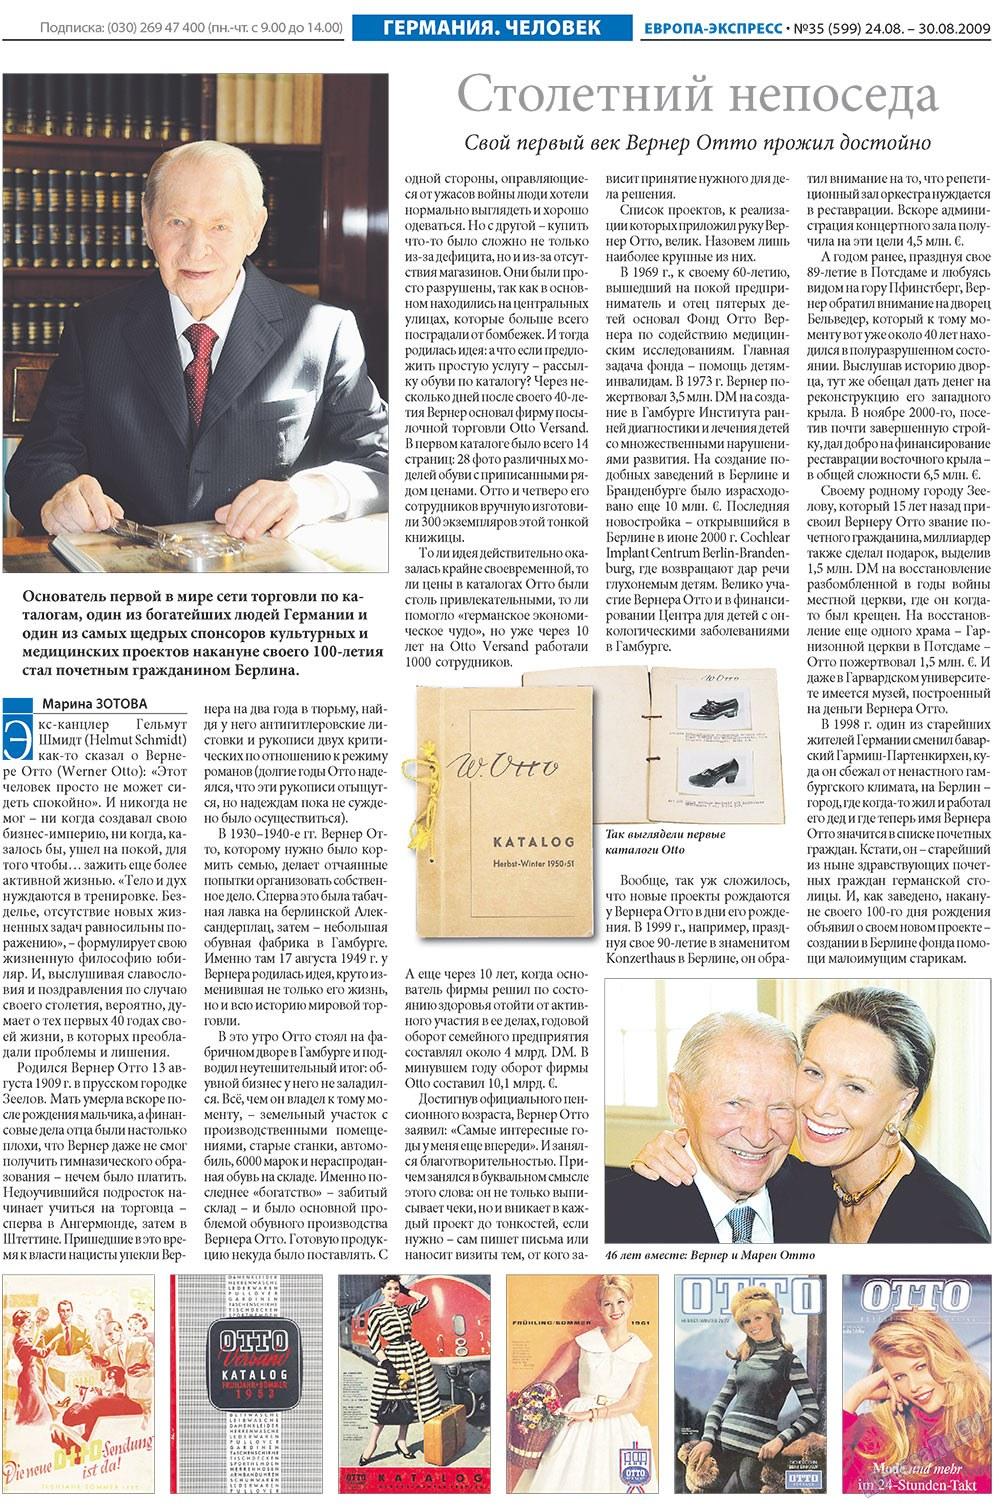 Европа экспресс (газета). 2009 год, номер 35, стр. 4